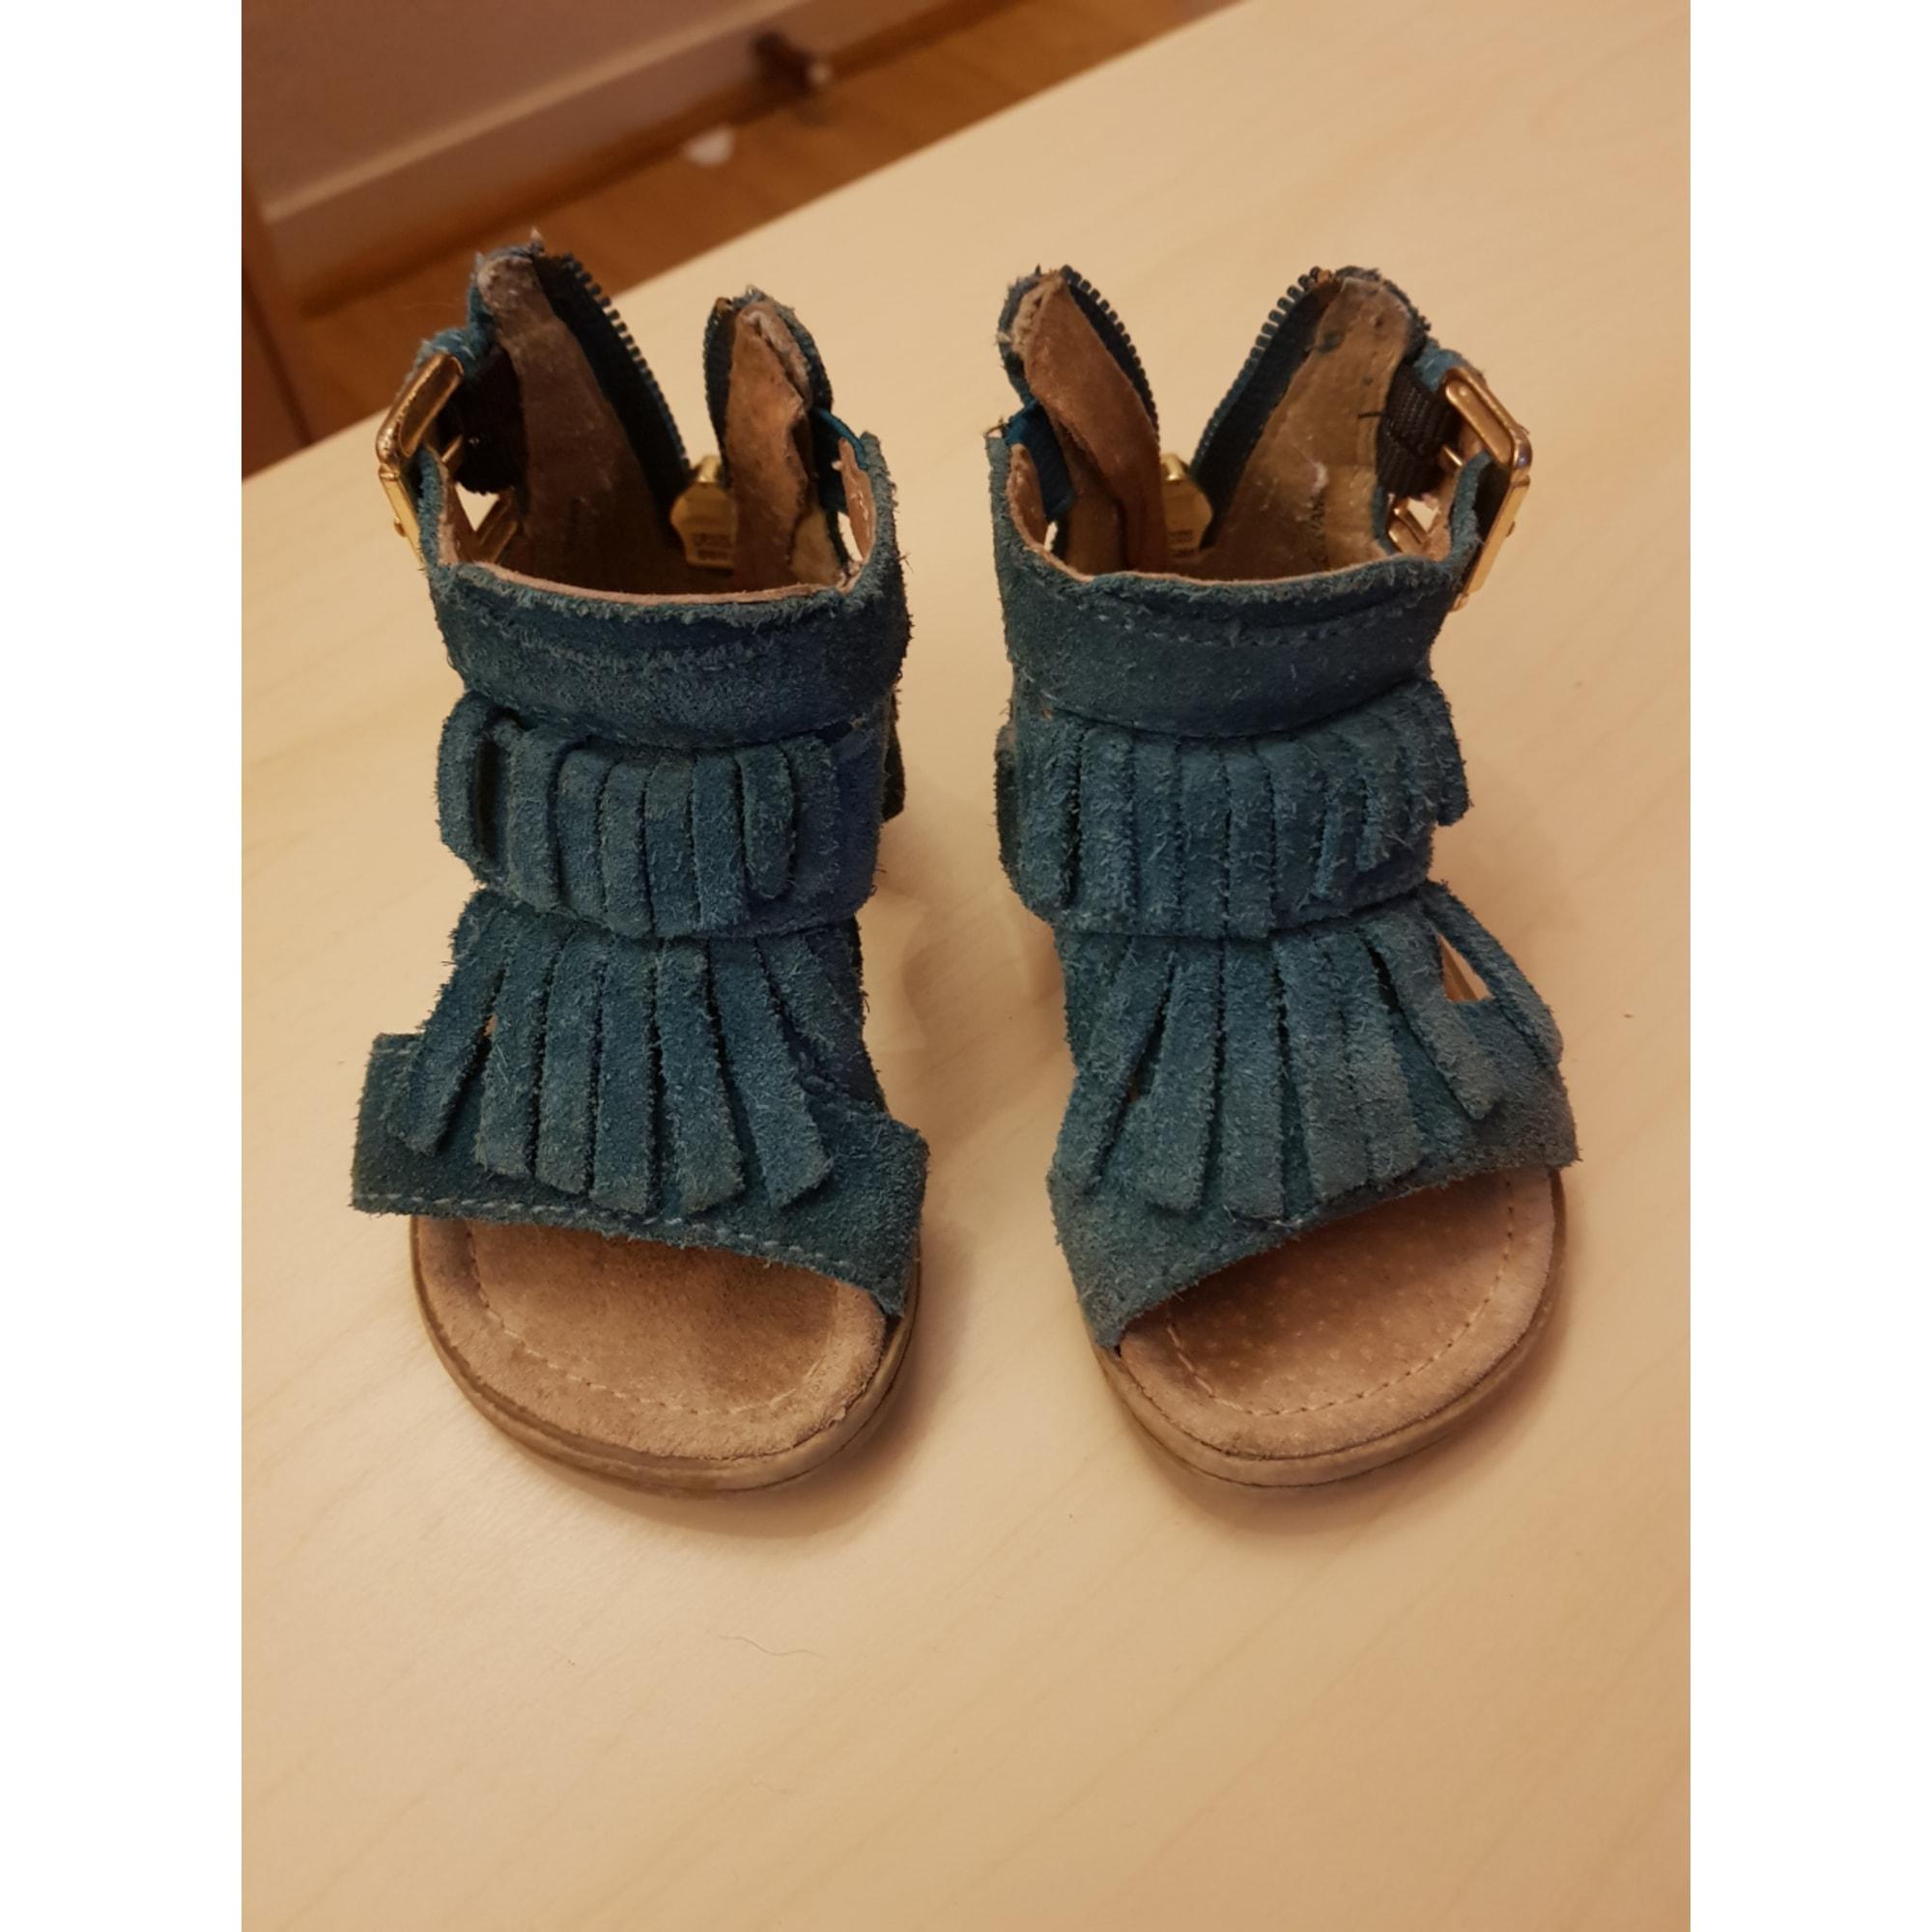 Sandales CREEKS Bleu, bleu marine, bleu turquoise